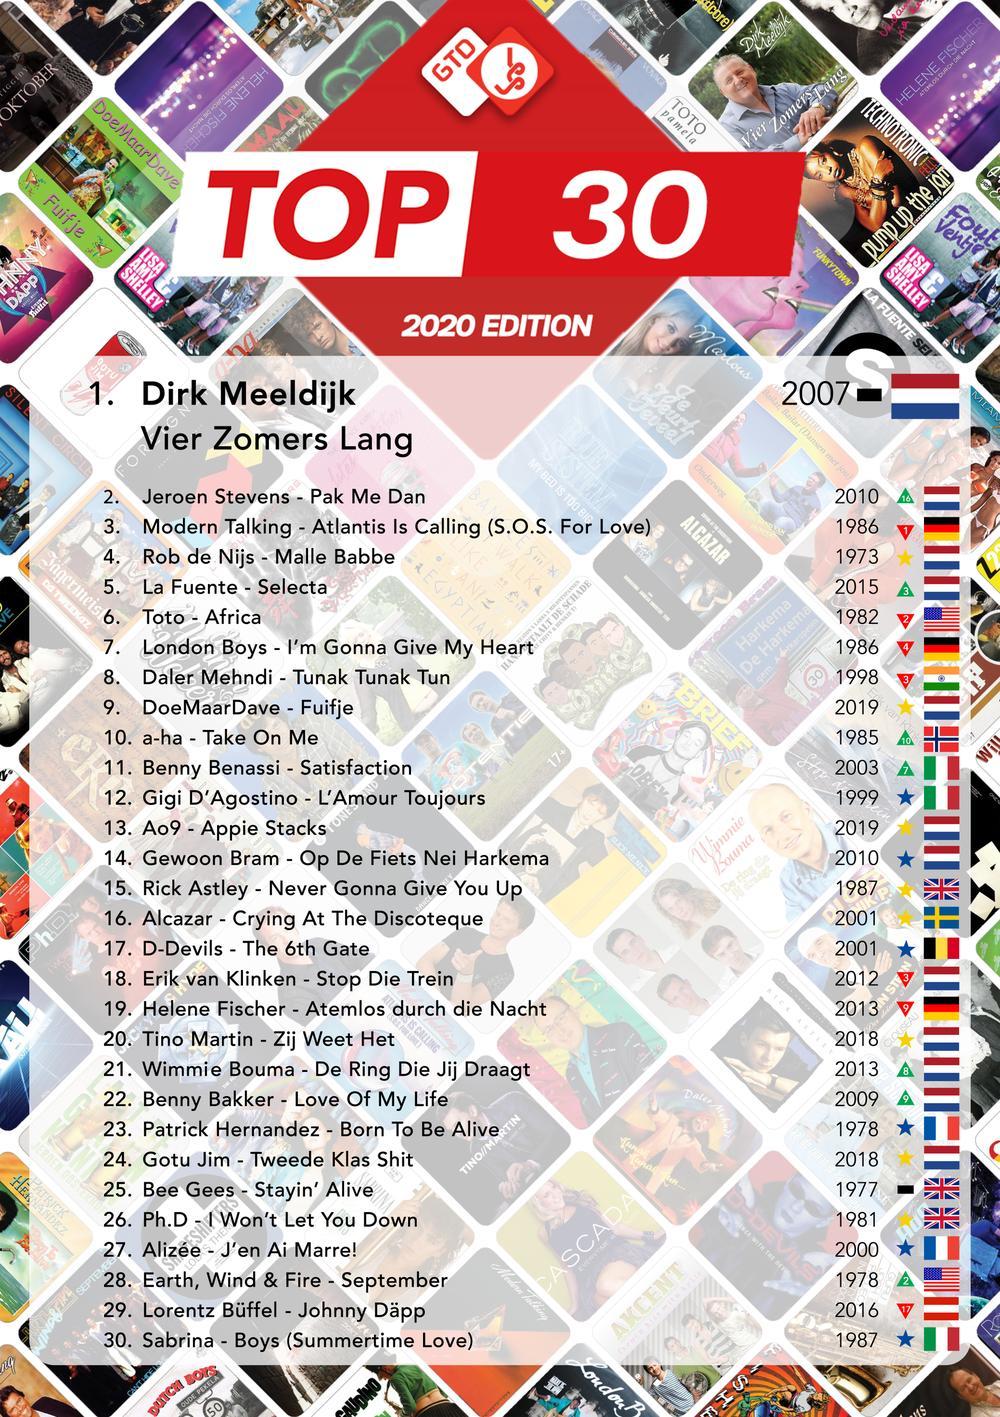 Top_30_poster.jpg